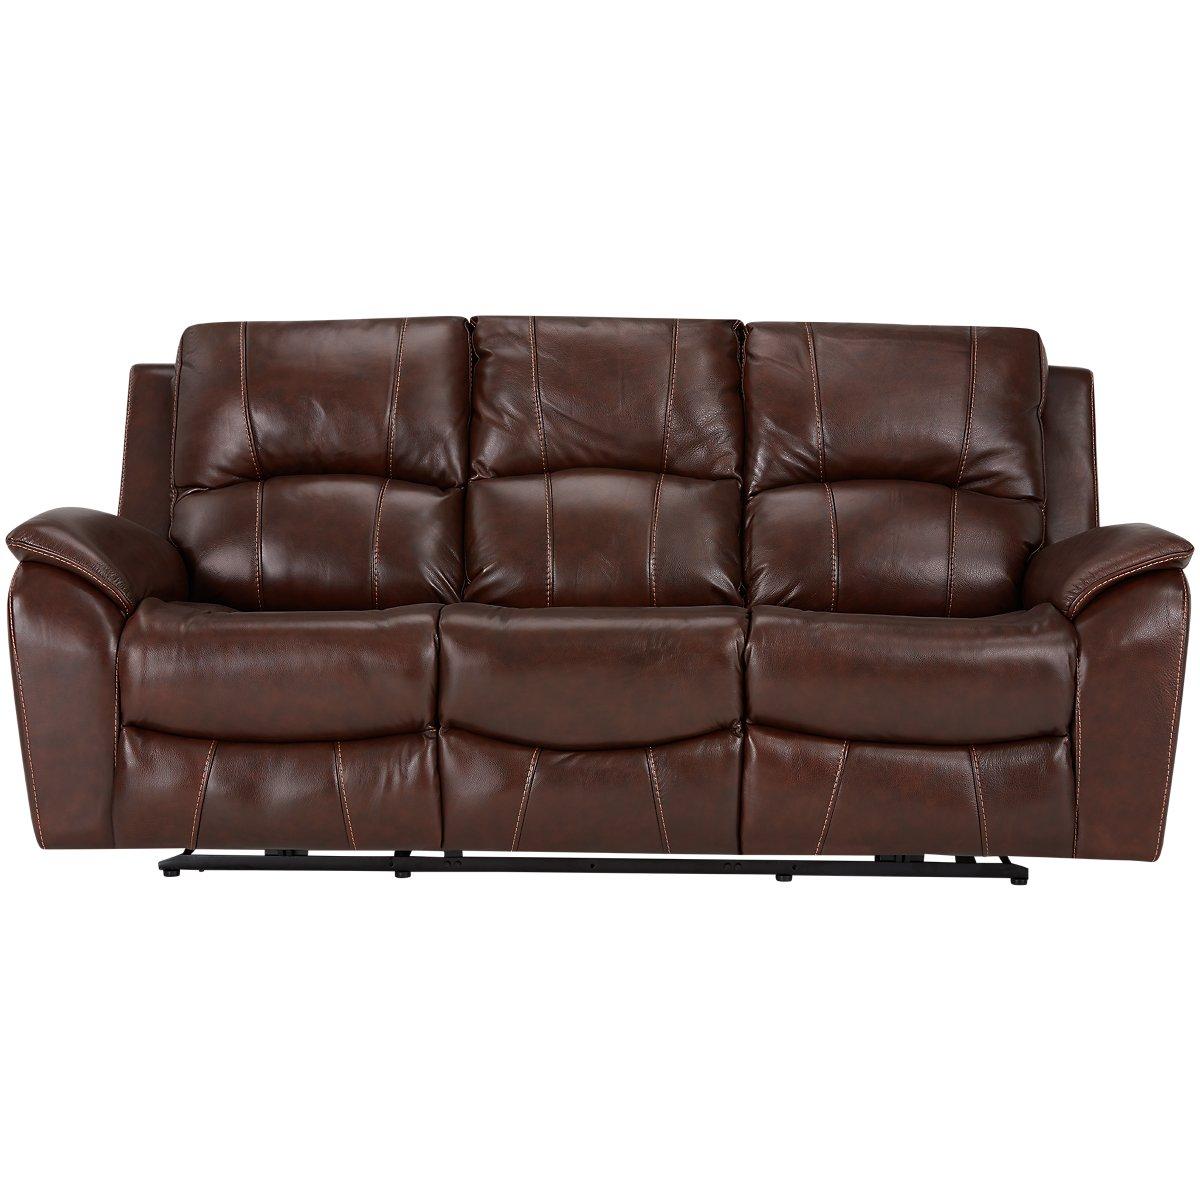 city furniture memphis medium brown leather power reclining sofa. Black Bedroom Furniture Sets. Home Design Ideas